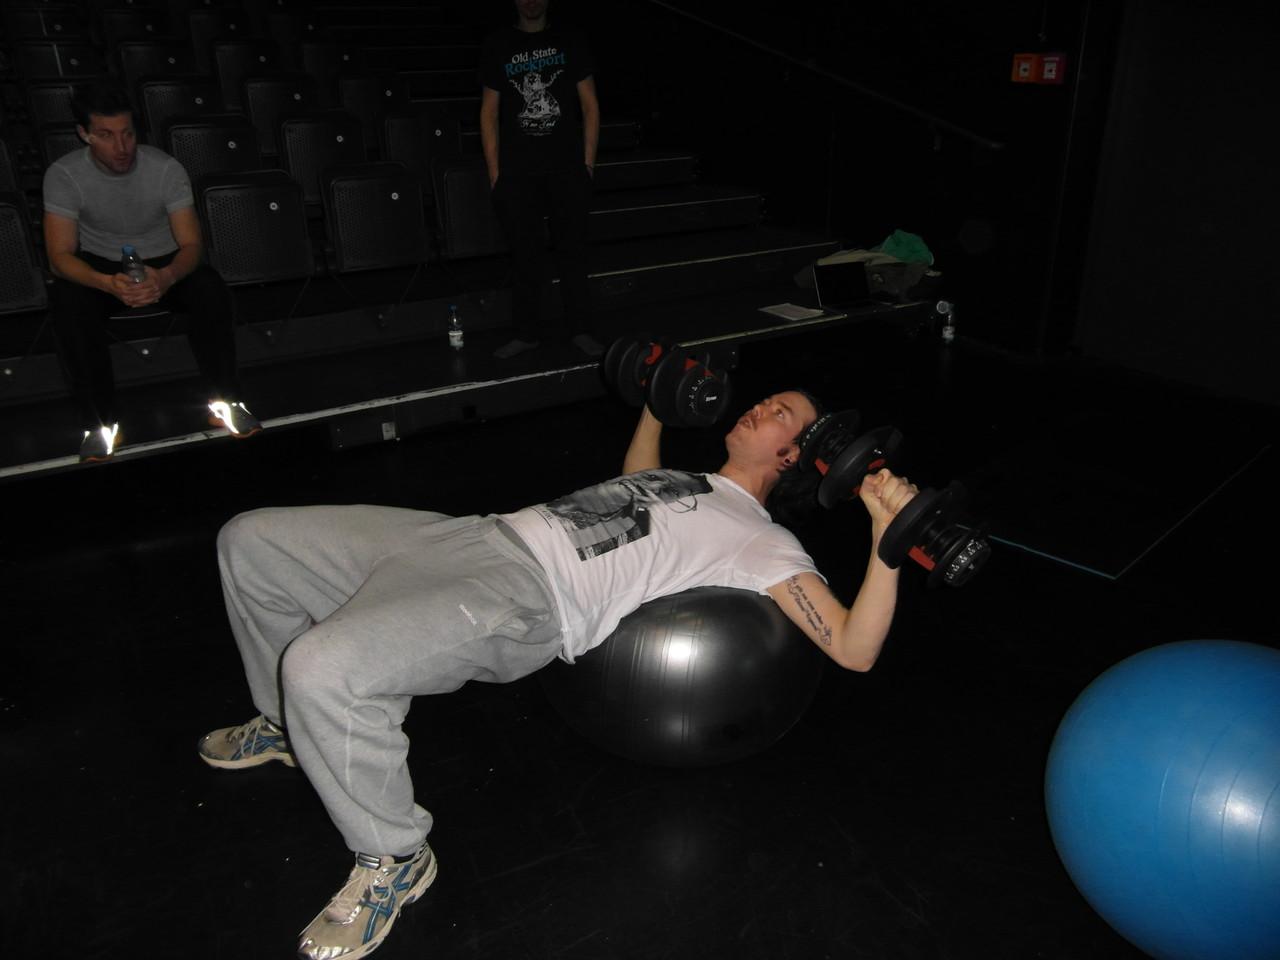 Koordinatives Krafttraining mit Hantel und Gymnastikball